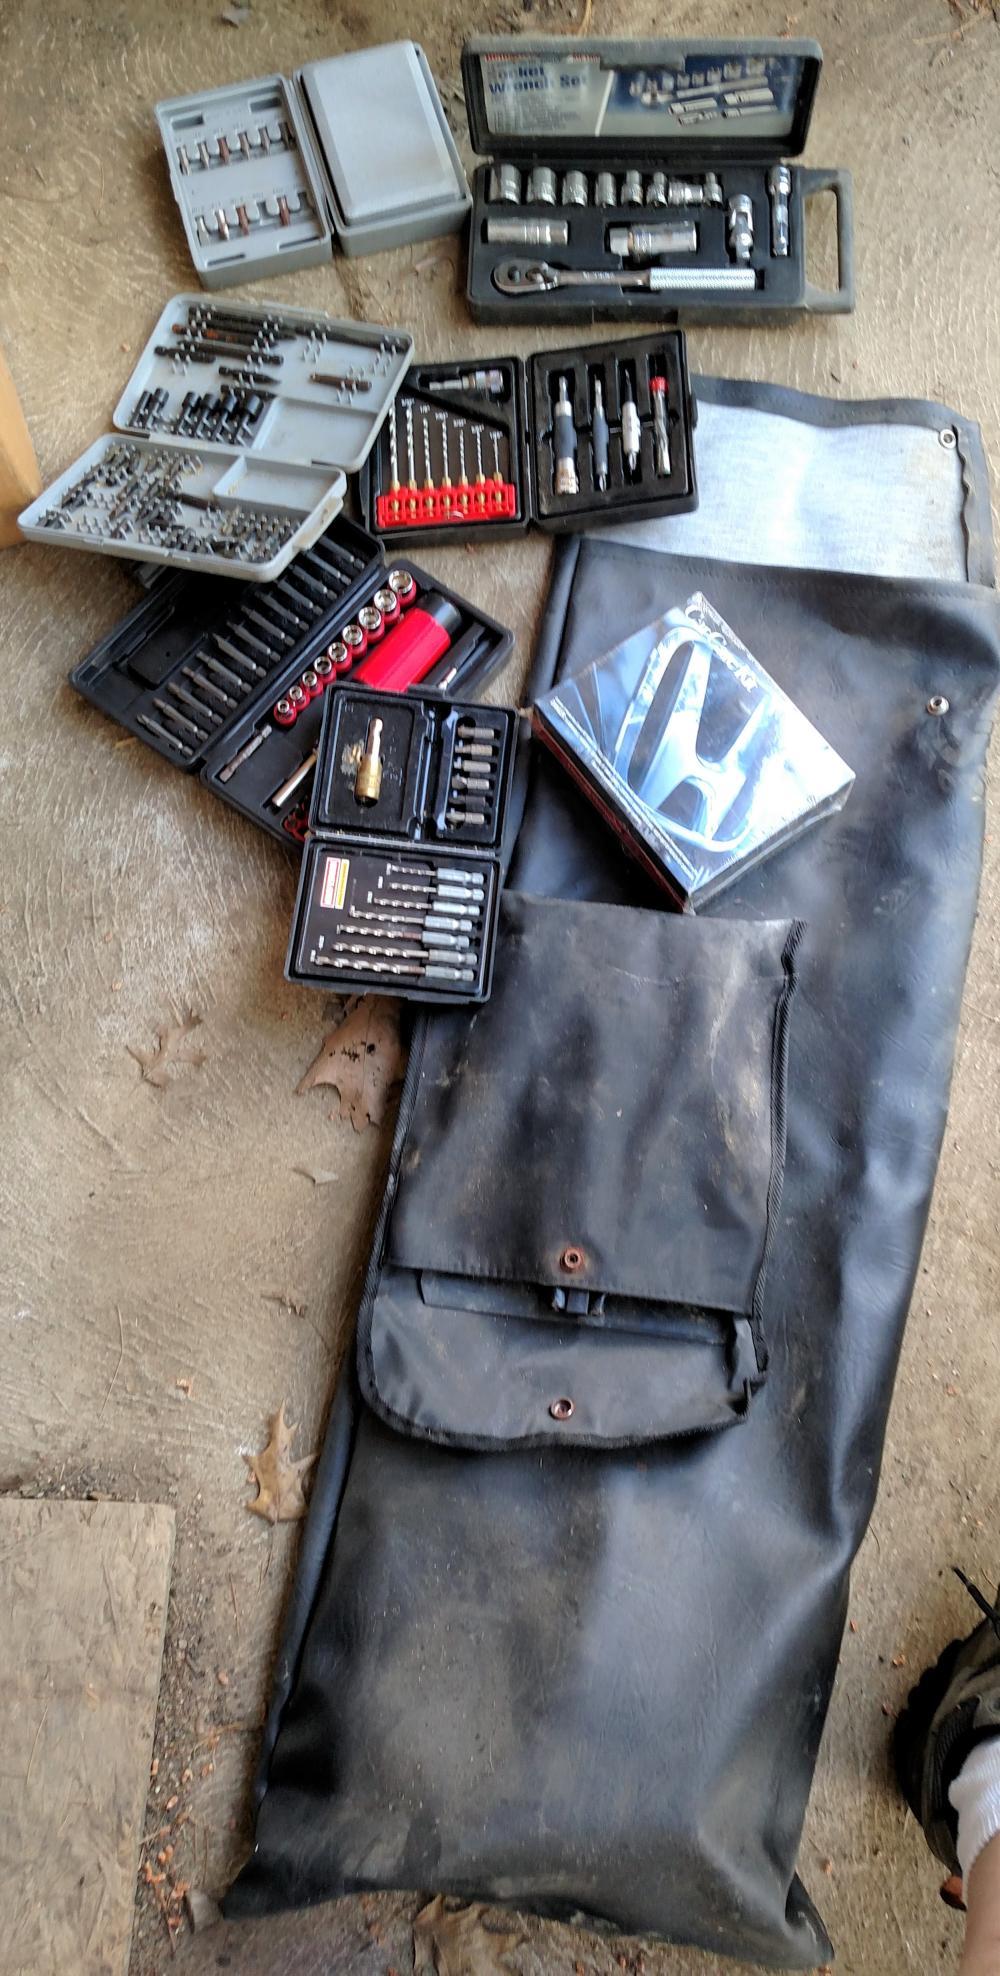 sockets, drill bits, variety of bits